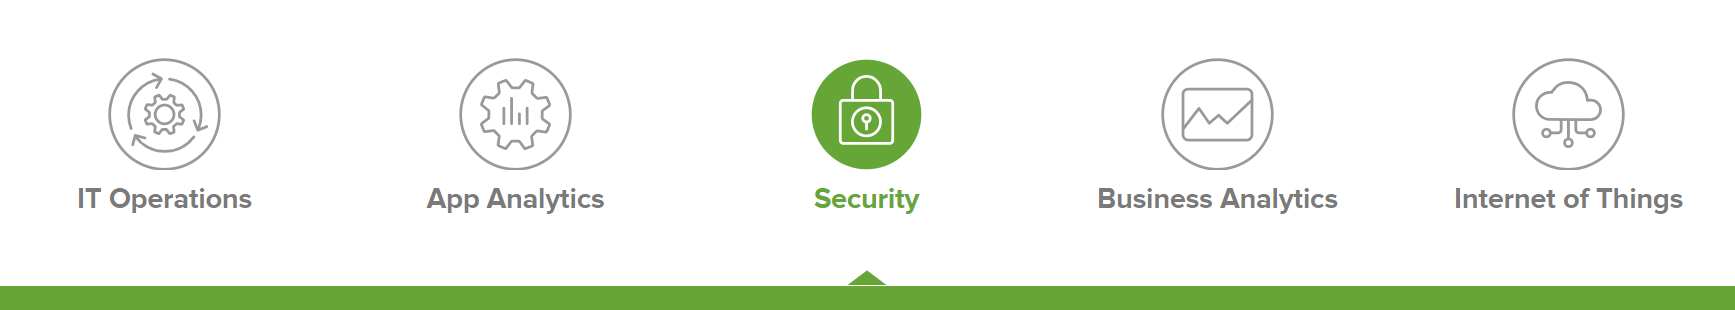 Зачем вам нужен Splunk? Аналитика событий безопасности - 2